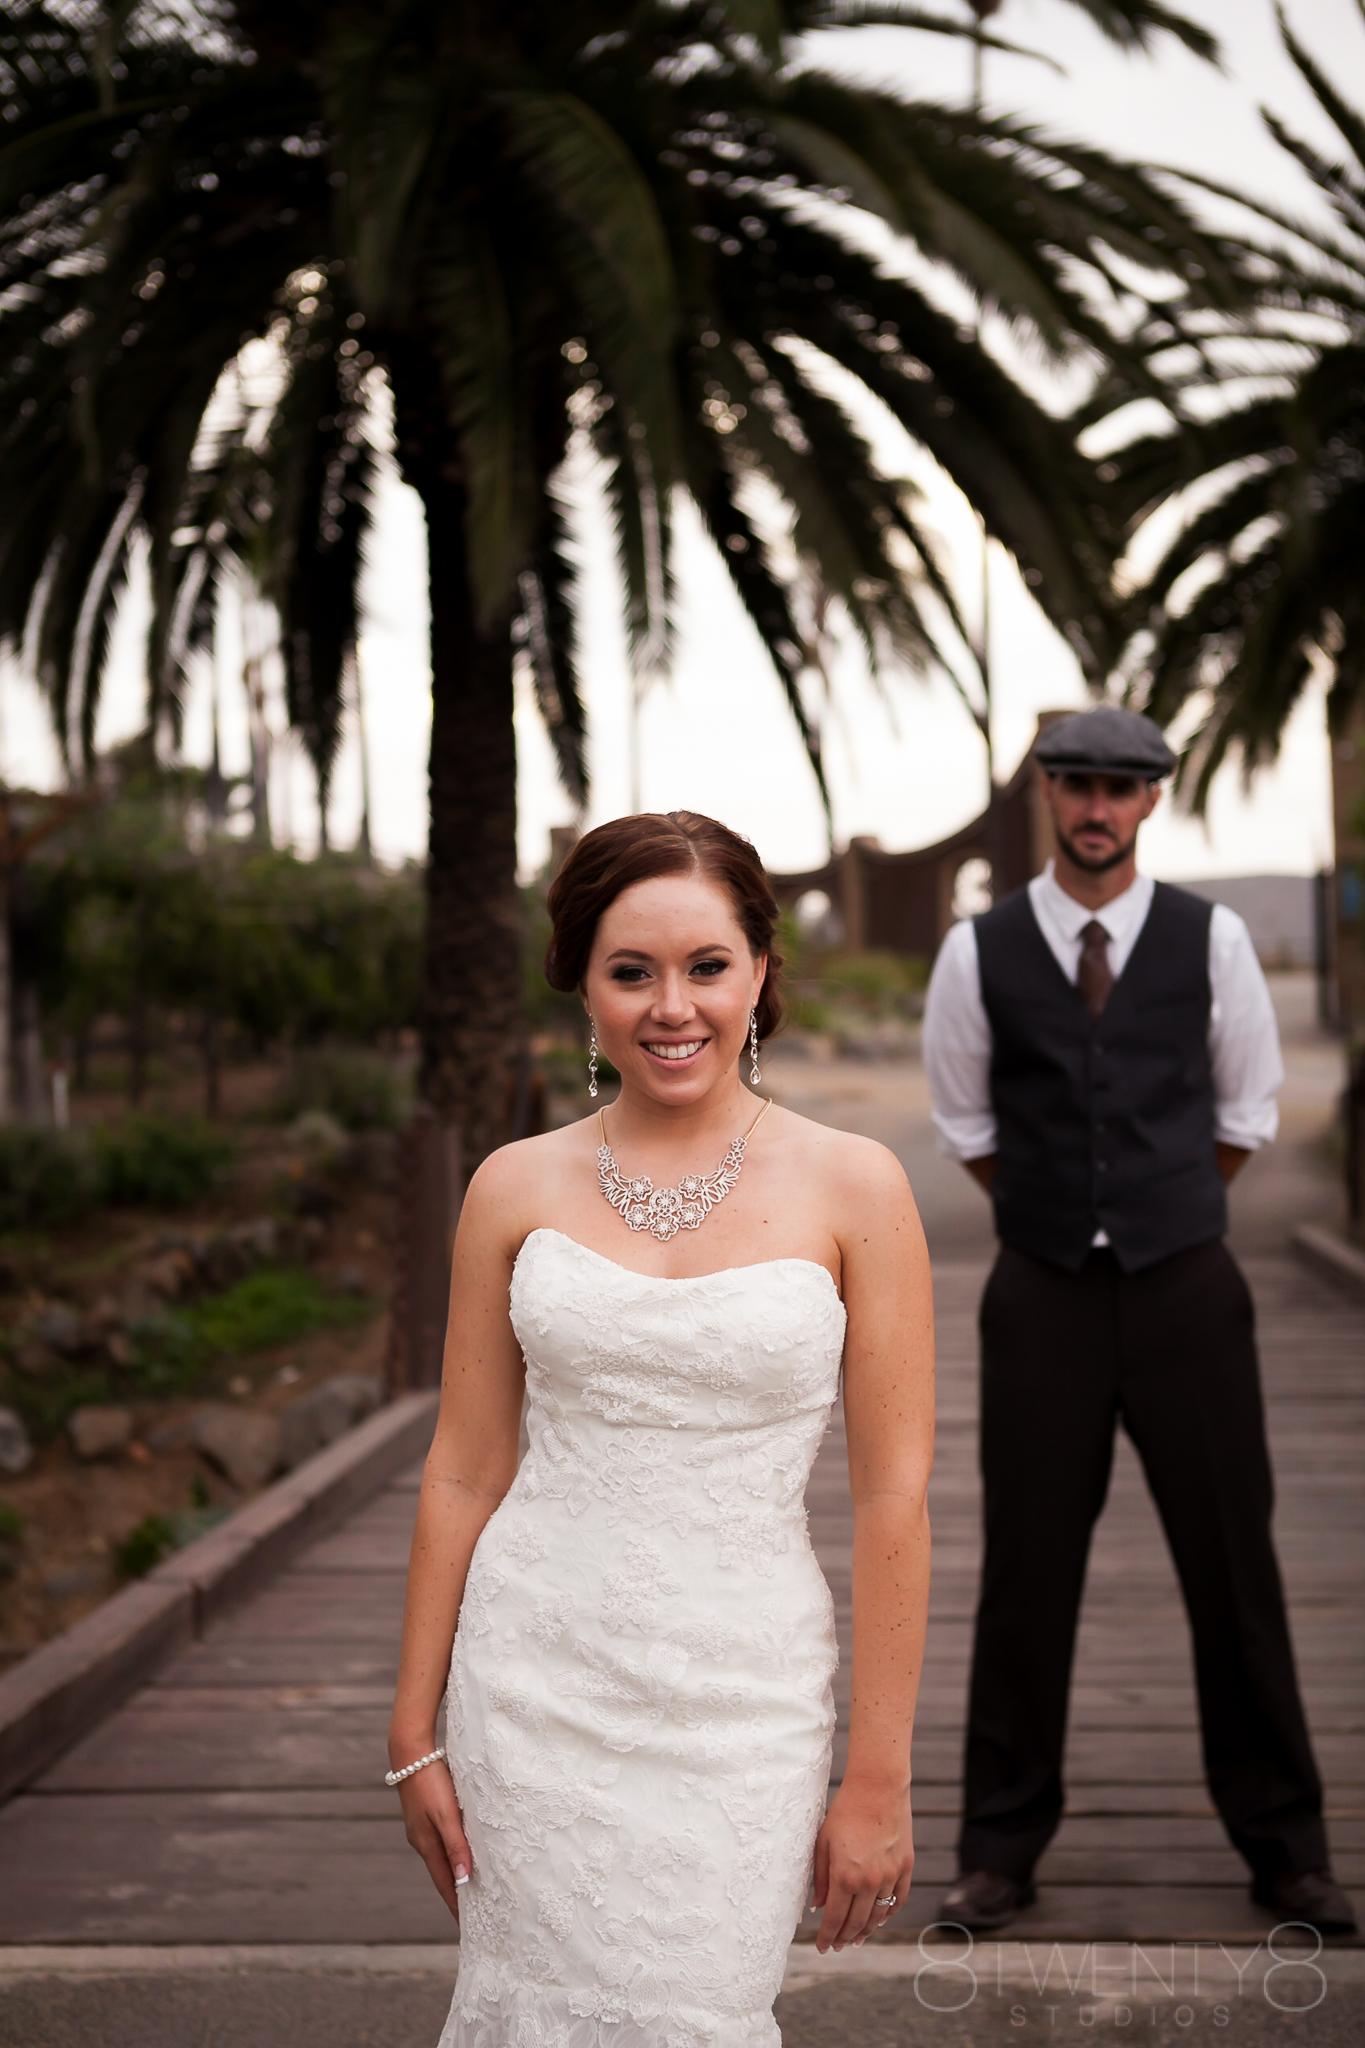 0436-130720-kelly-ryan-wedding.jpg